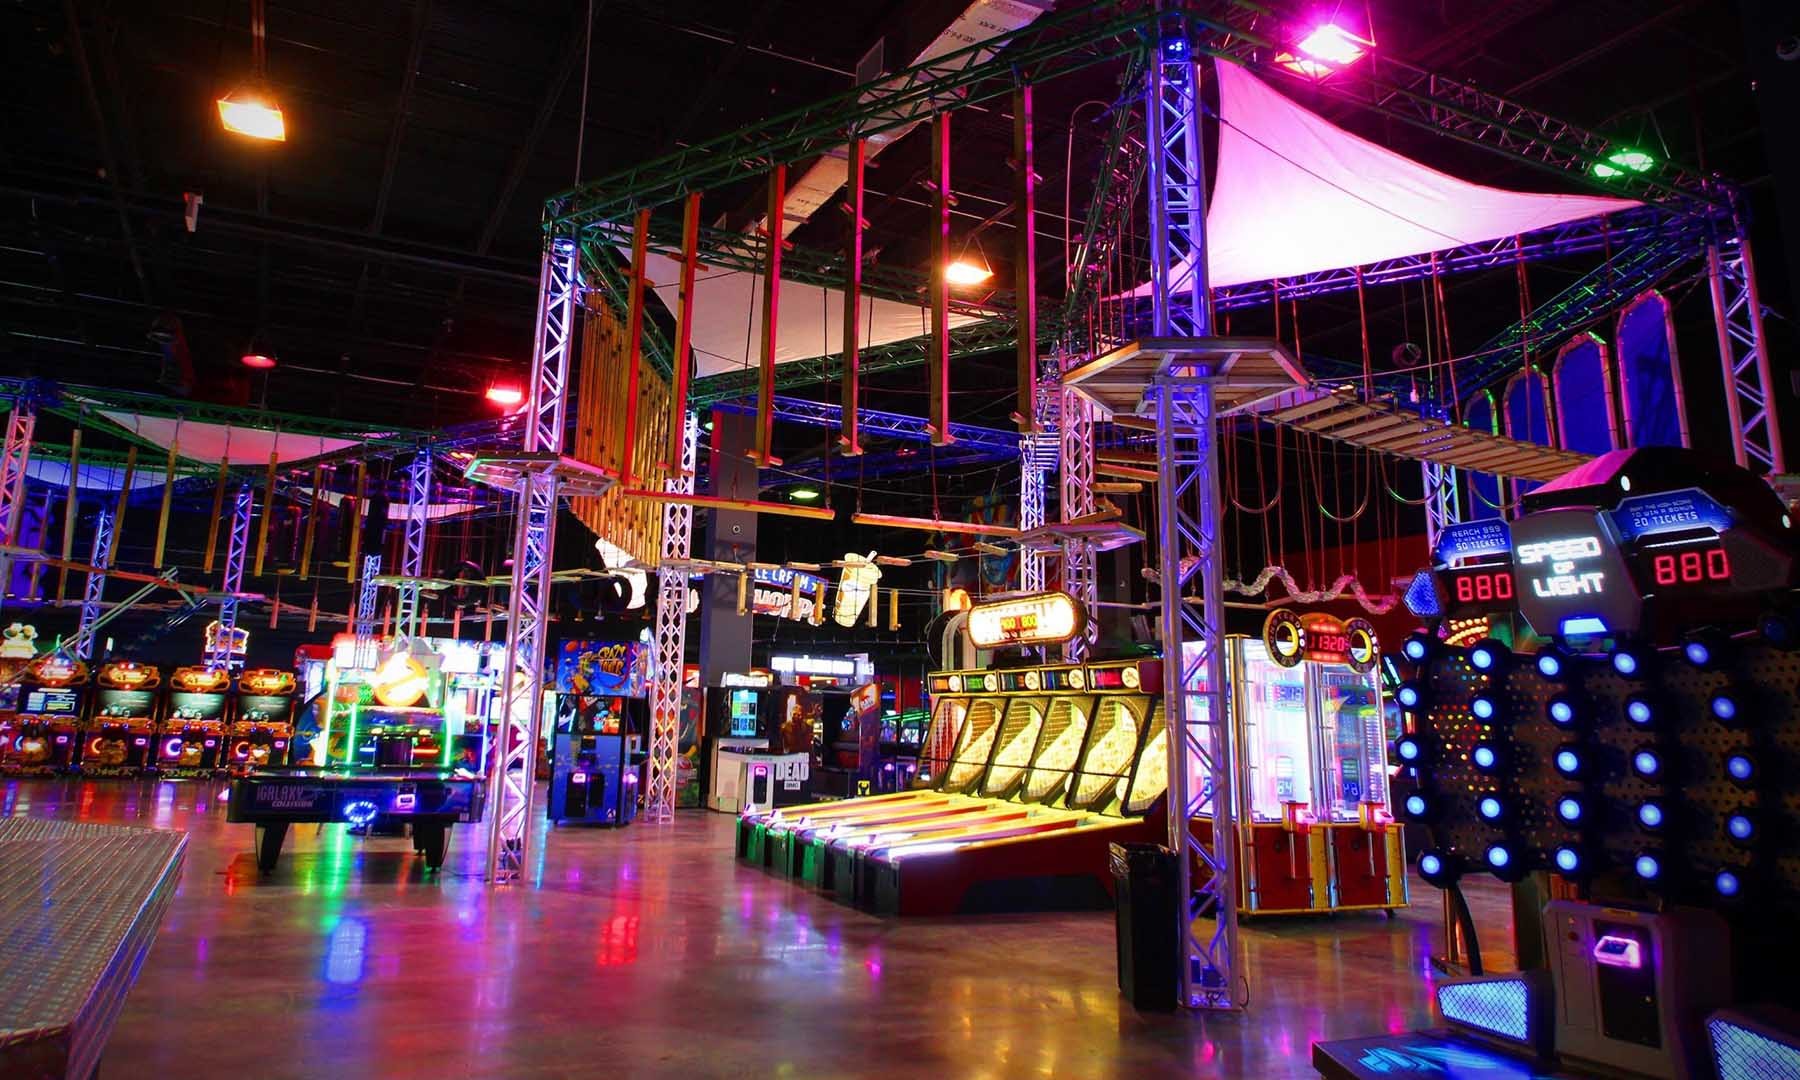 Arcade View